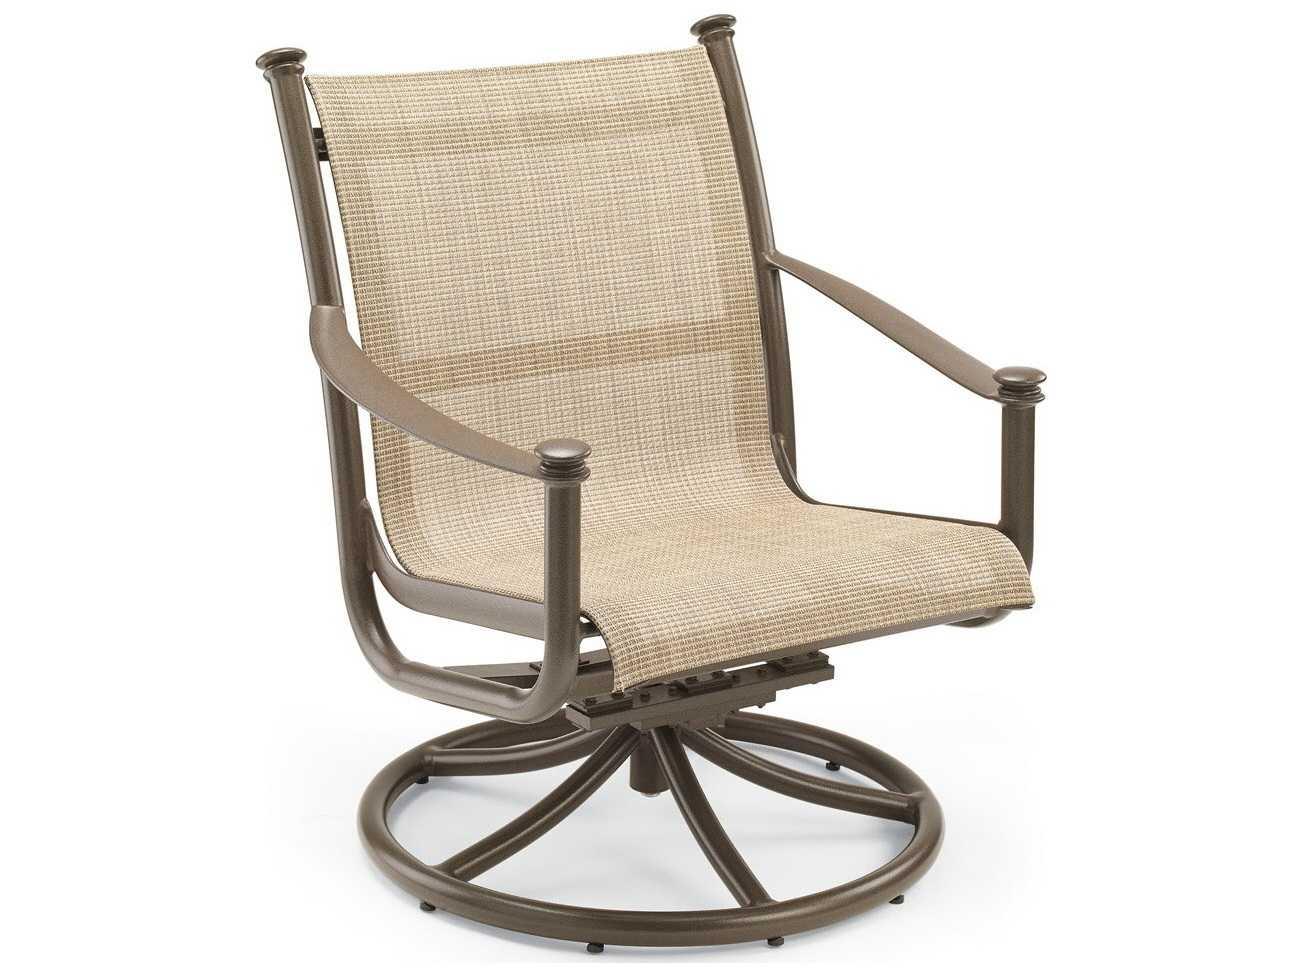 swivel chaise lounge chair ergonomic karachi winston catania sling aluminum tilt chat